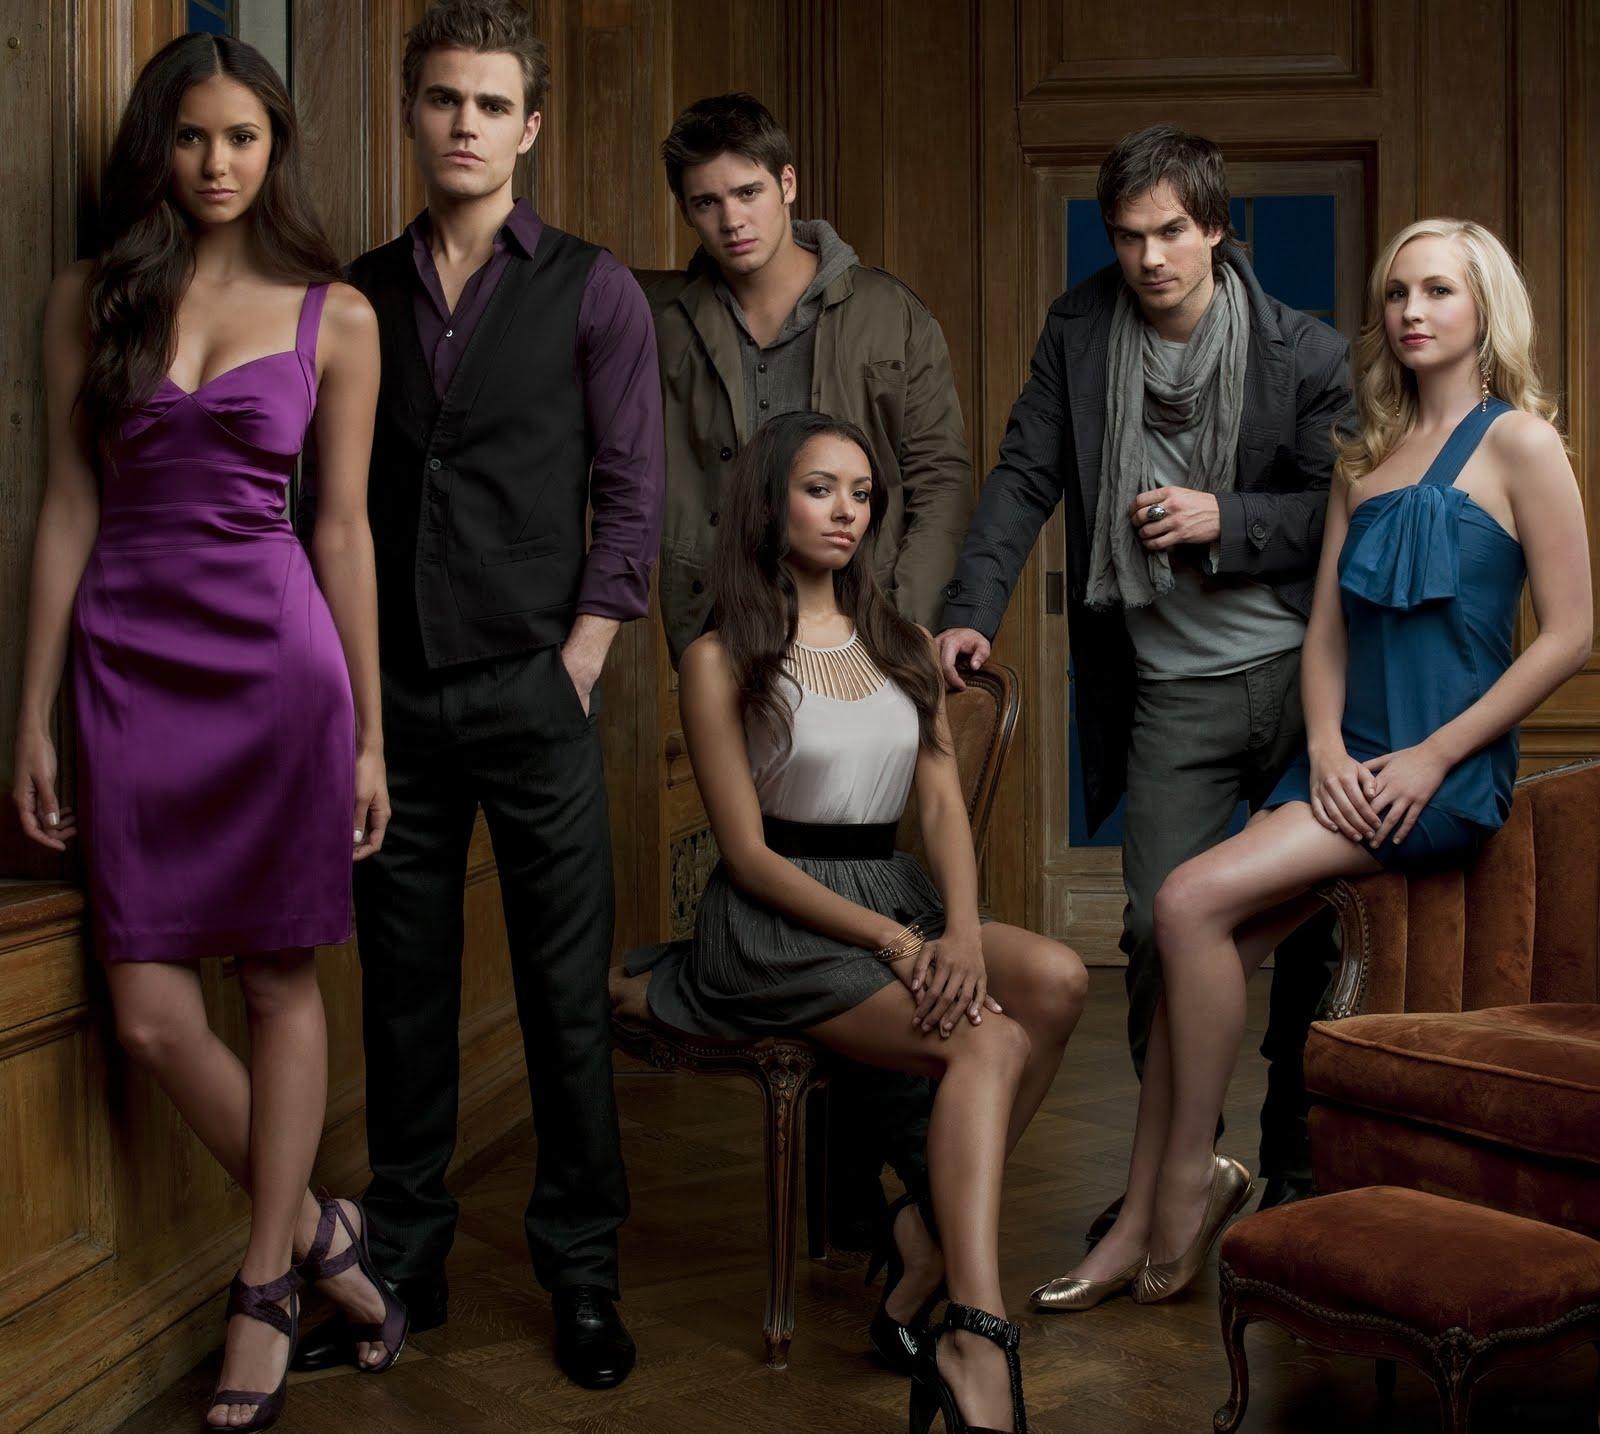 http://2.bp.blogspot.com/_pKEqhq77o9U/S9dMtAjwHmI/AAAAAAAABQE/8GliLq3zgUY/s1600/vampire-diaries-season-1-fond-ecran-groupe.jpg